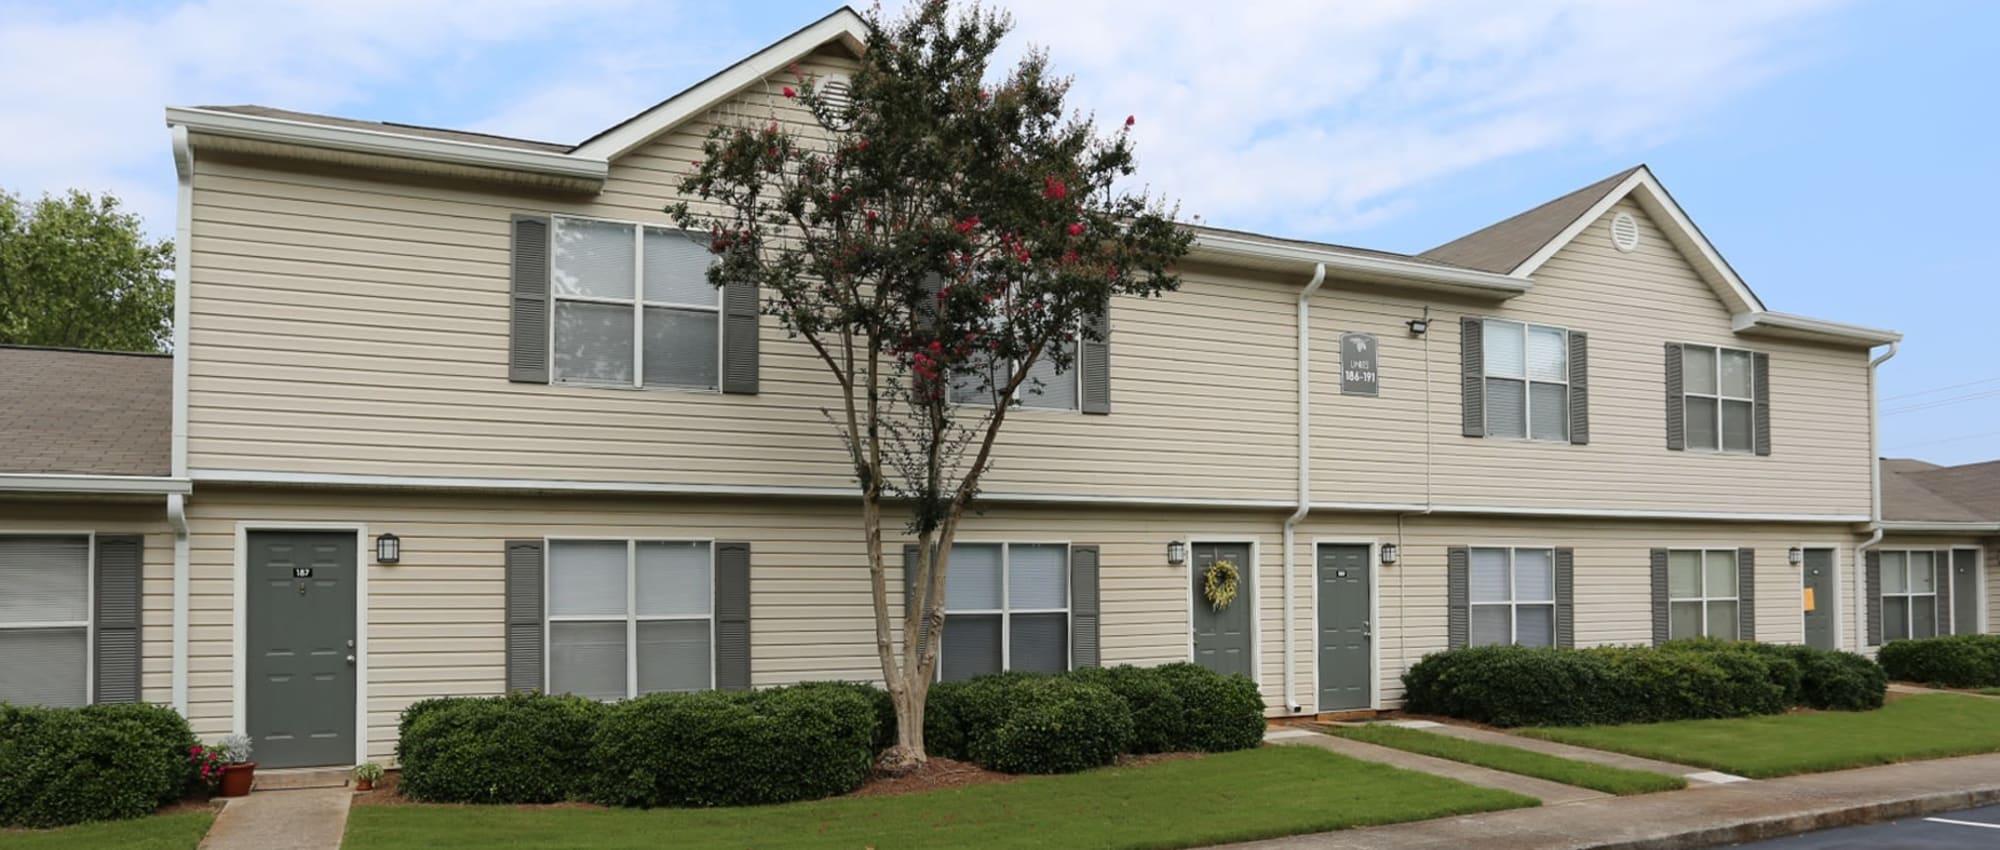 Apartments at Madison Pines in Madison, Alabama